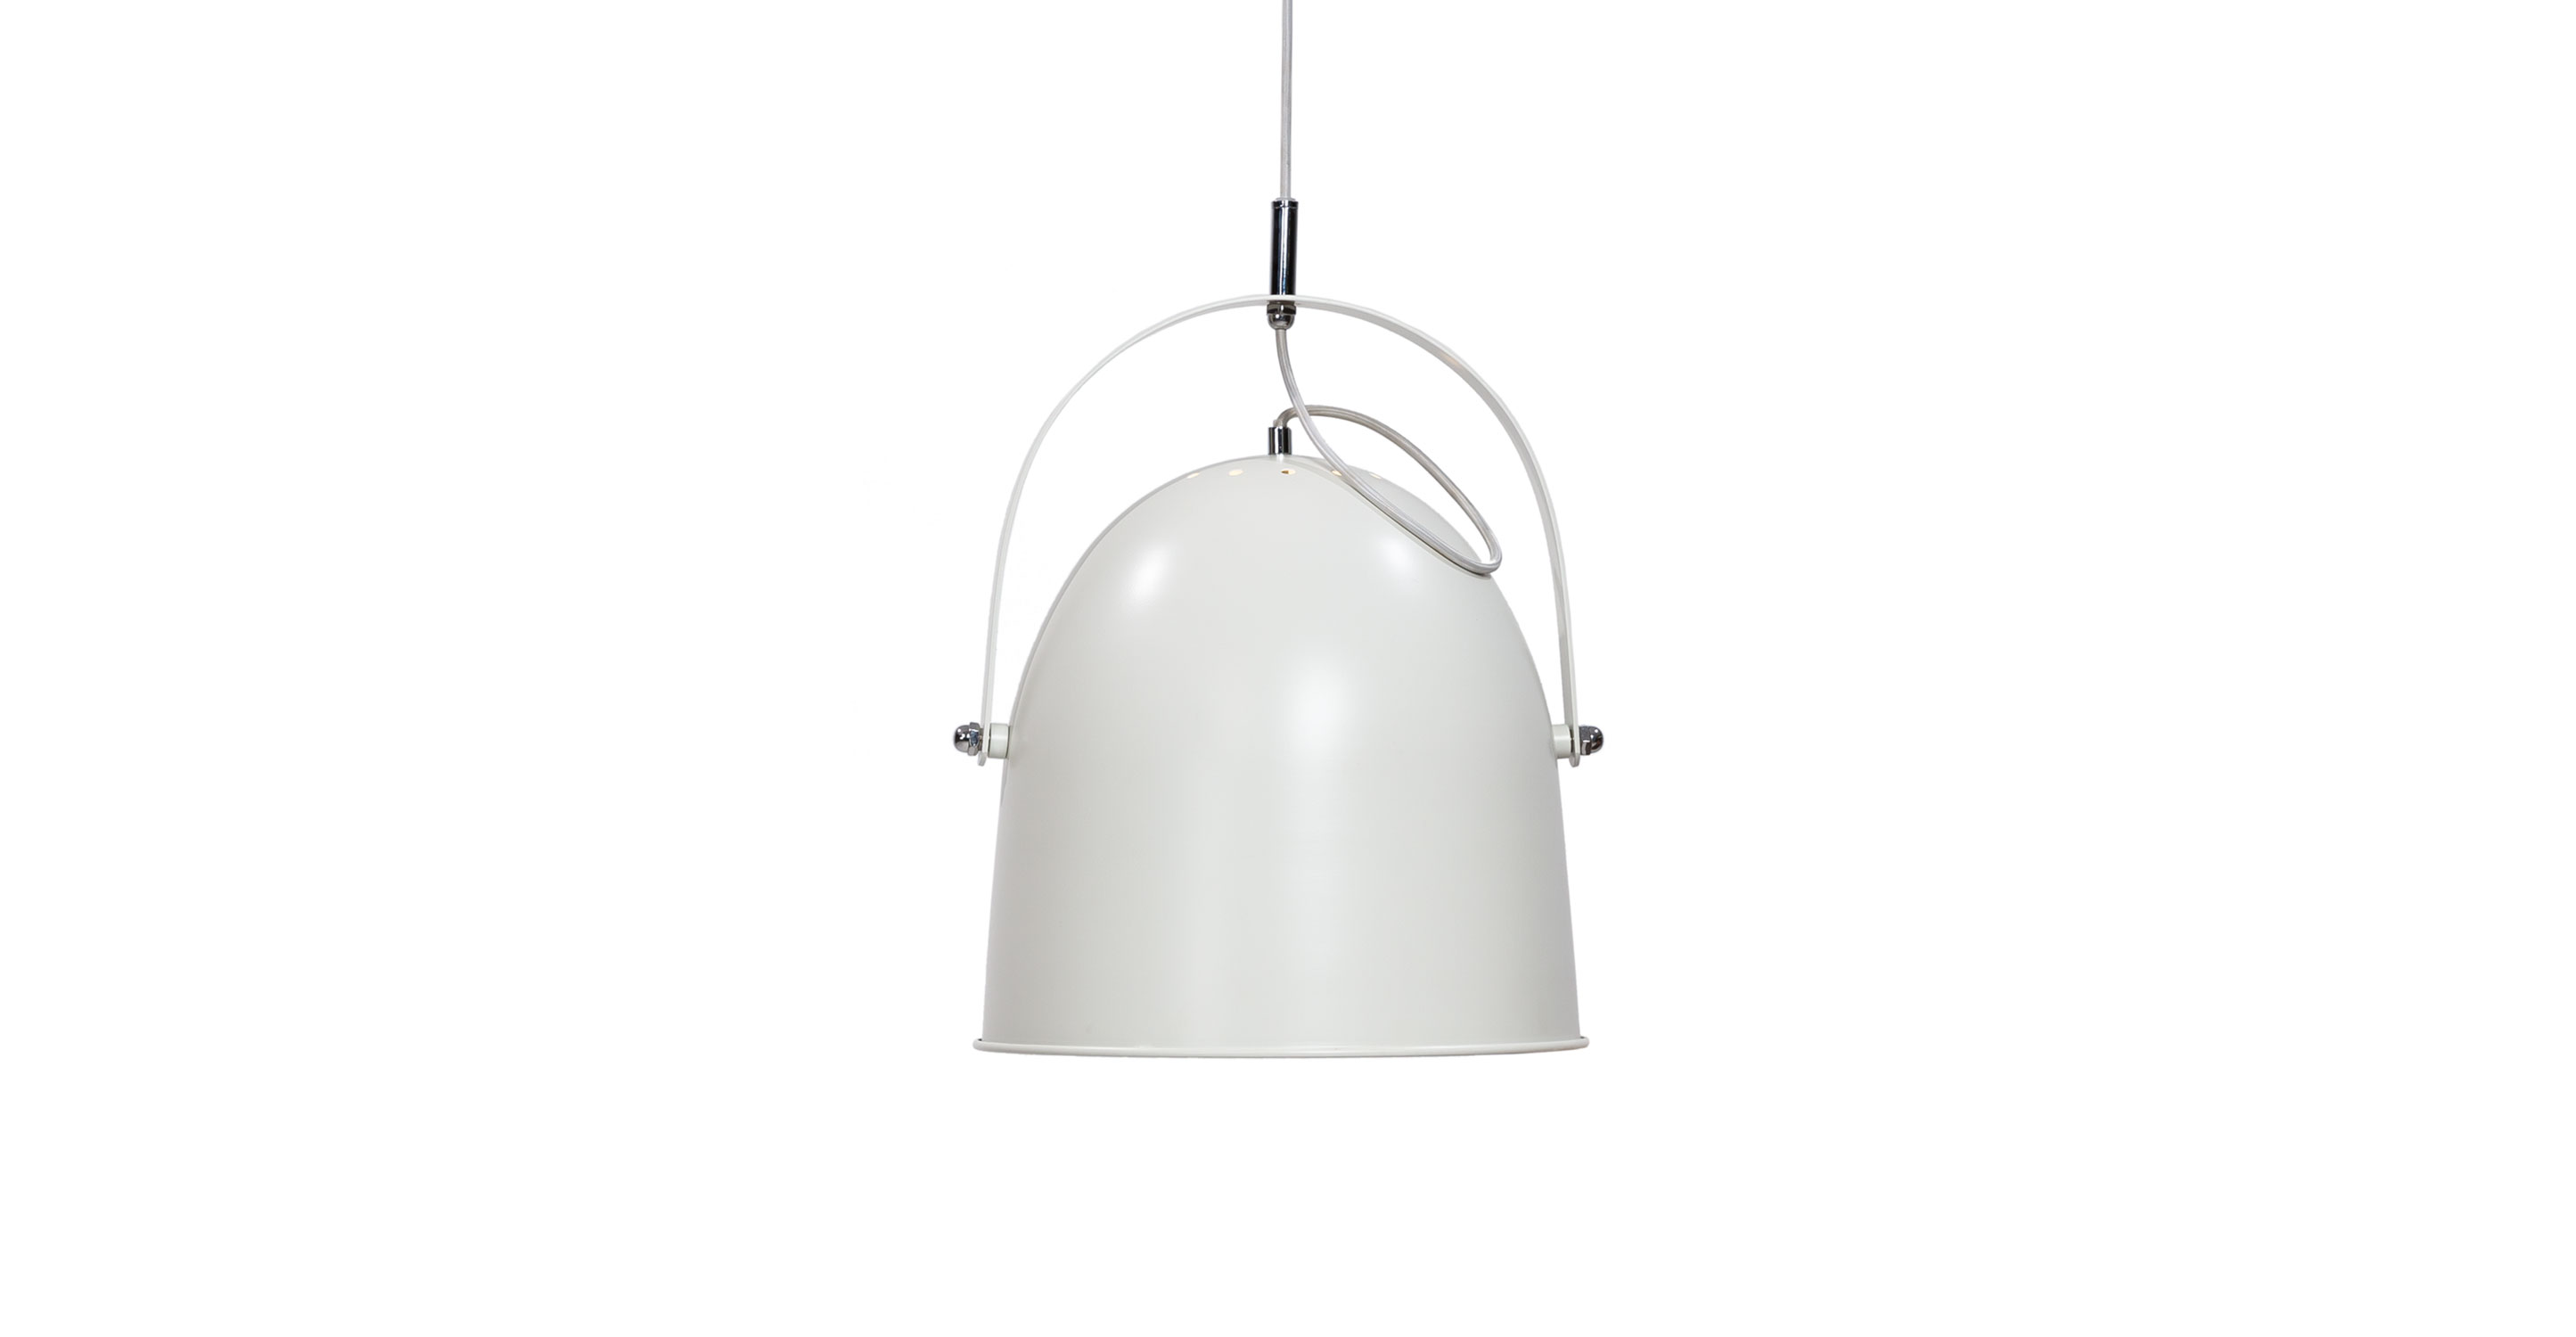 Pivot White Pendant Lamp Lighting Article Modern Mid Century And Scandinavian Furniture